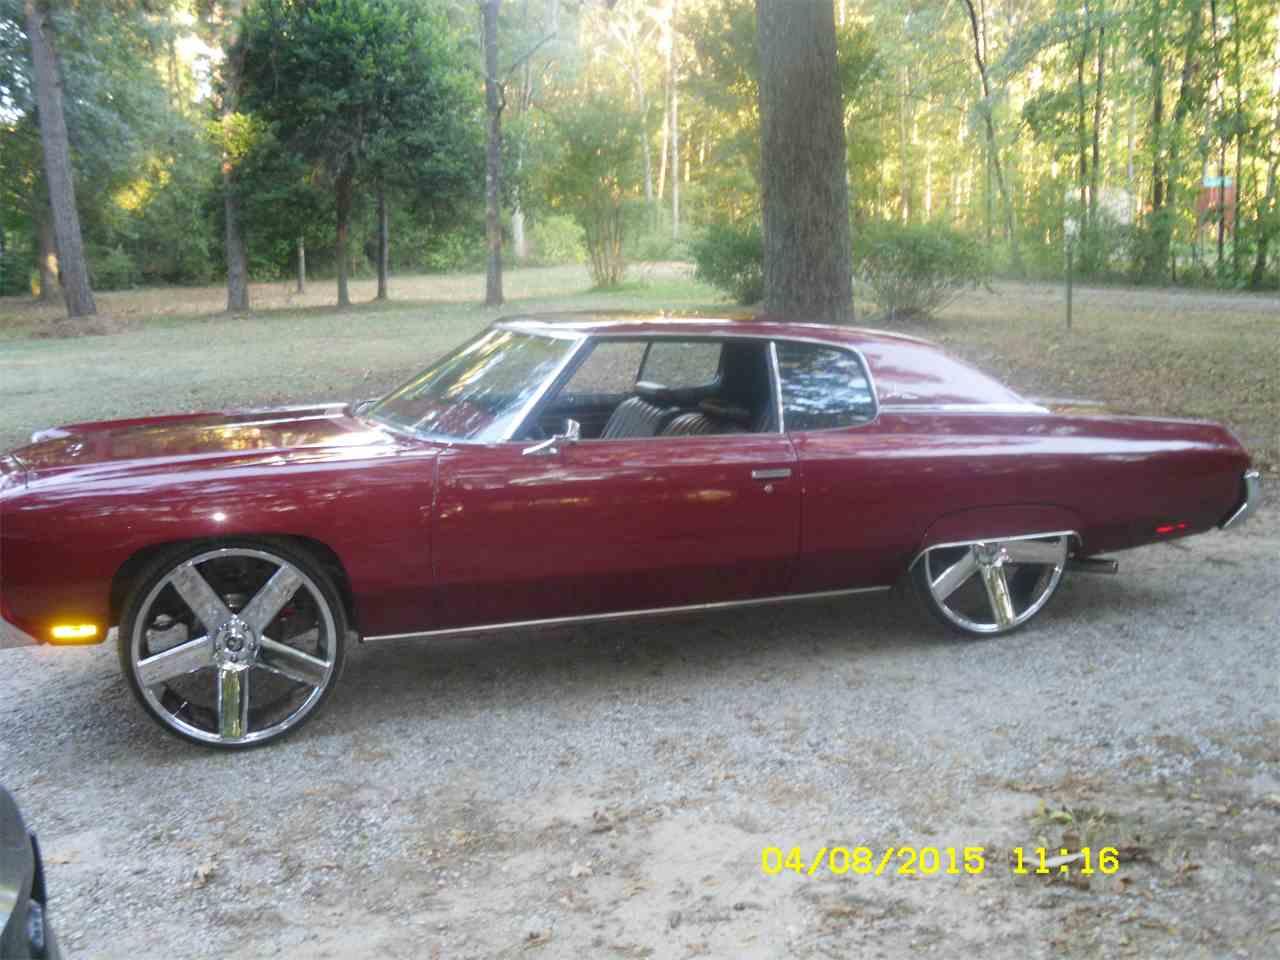 Large Picture of Classic '73 Impala located in Macon Georgia - $14,500.00 - JIZ7